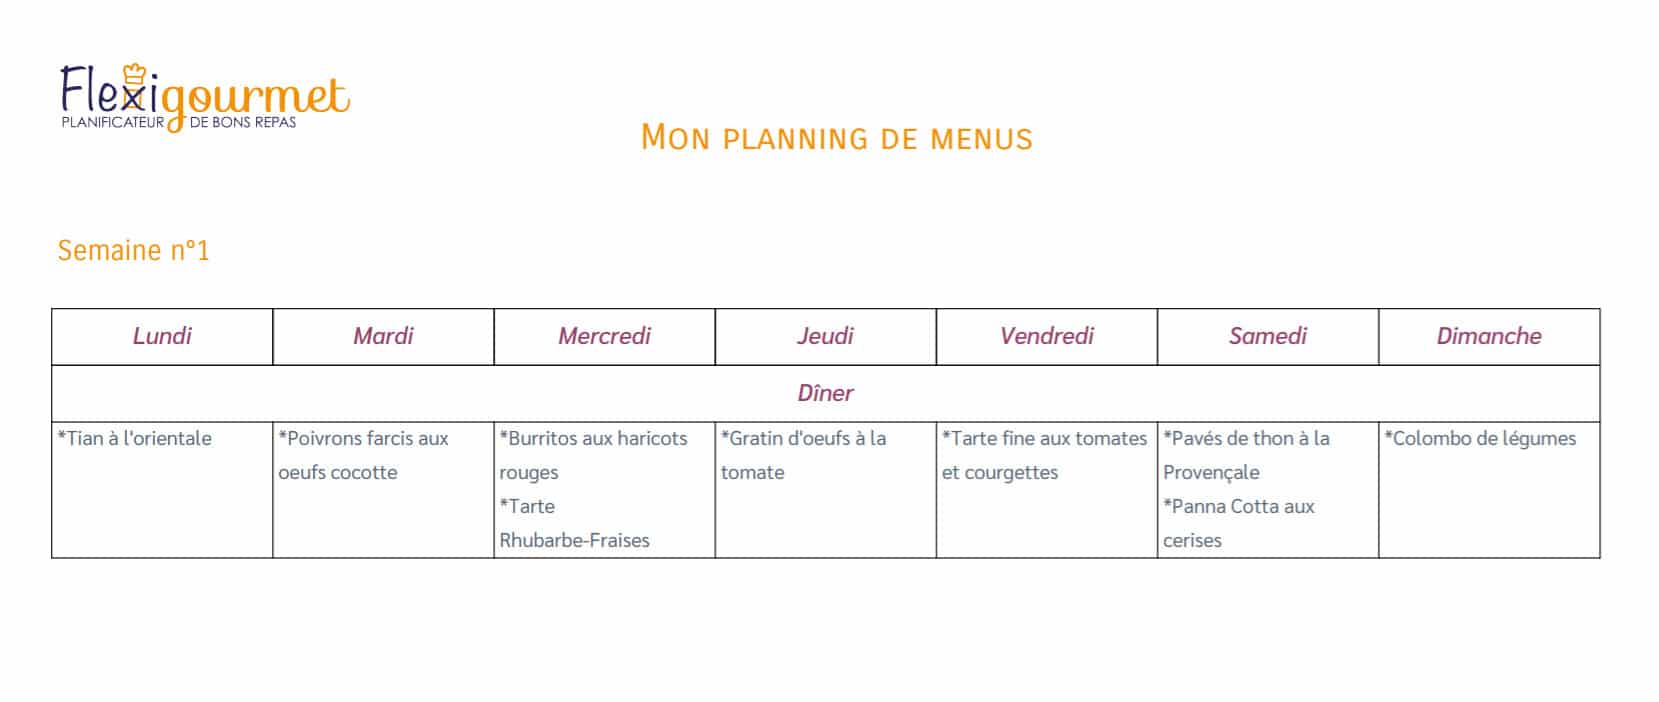 Flexigourmet : Planning de menus du 22 juin